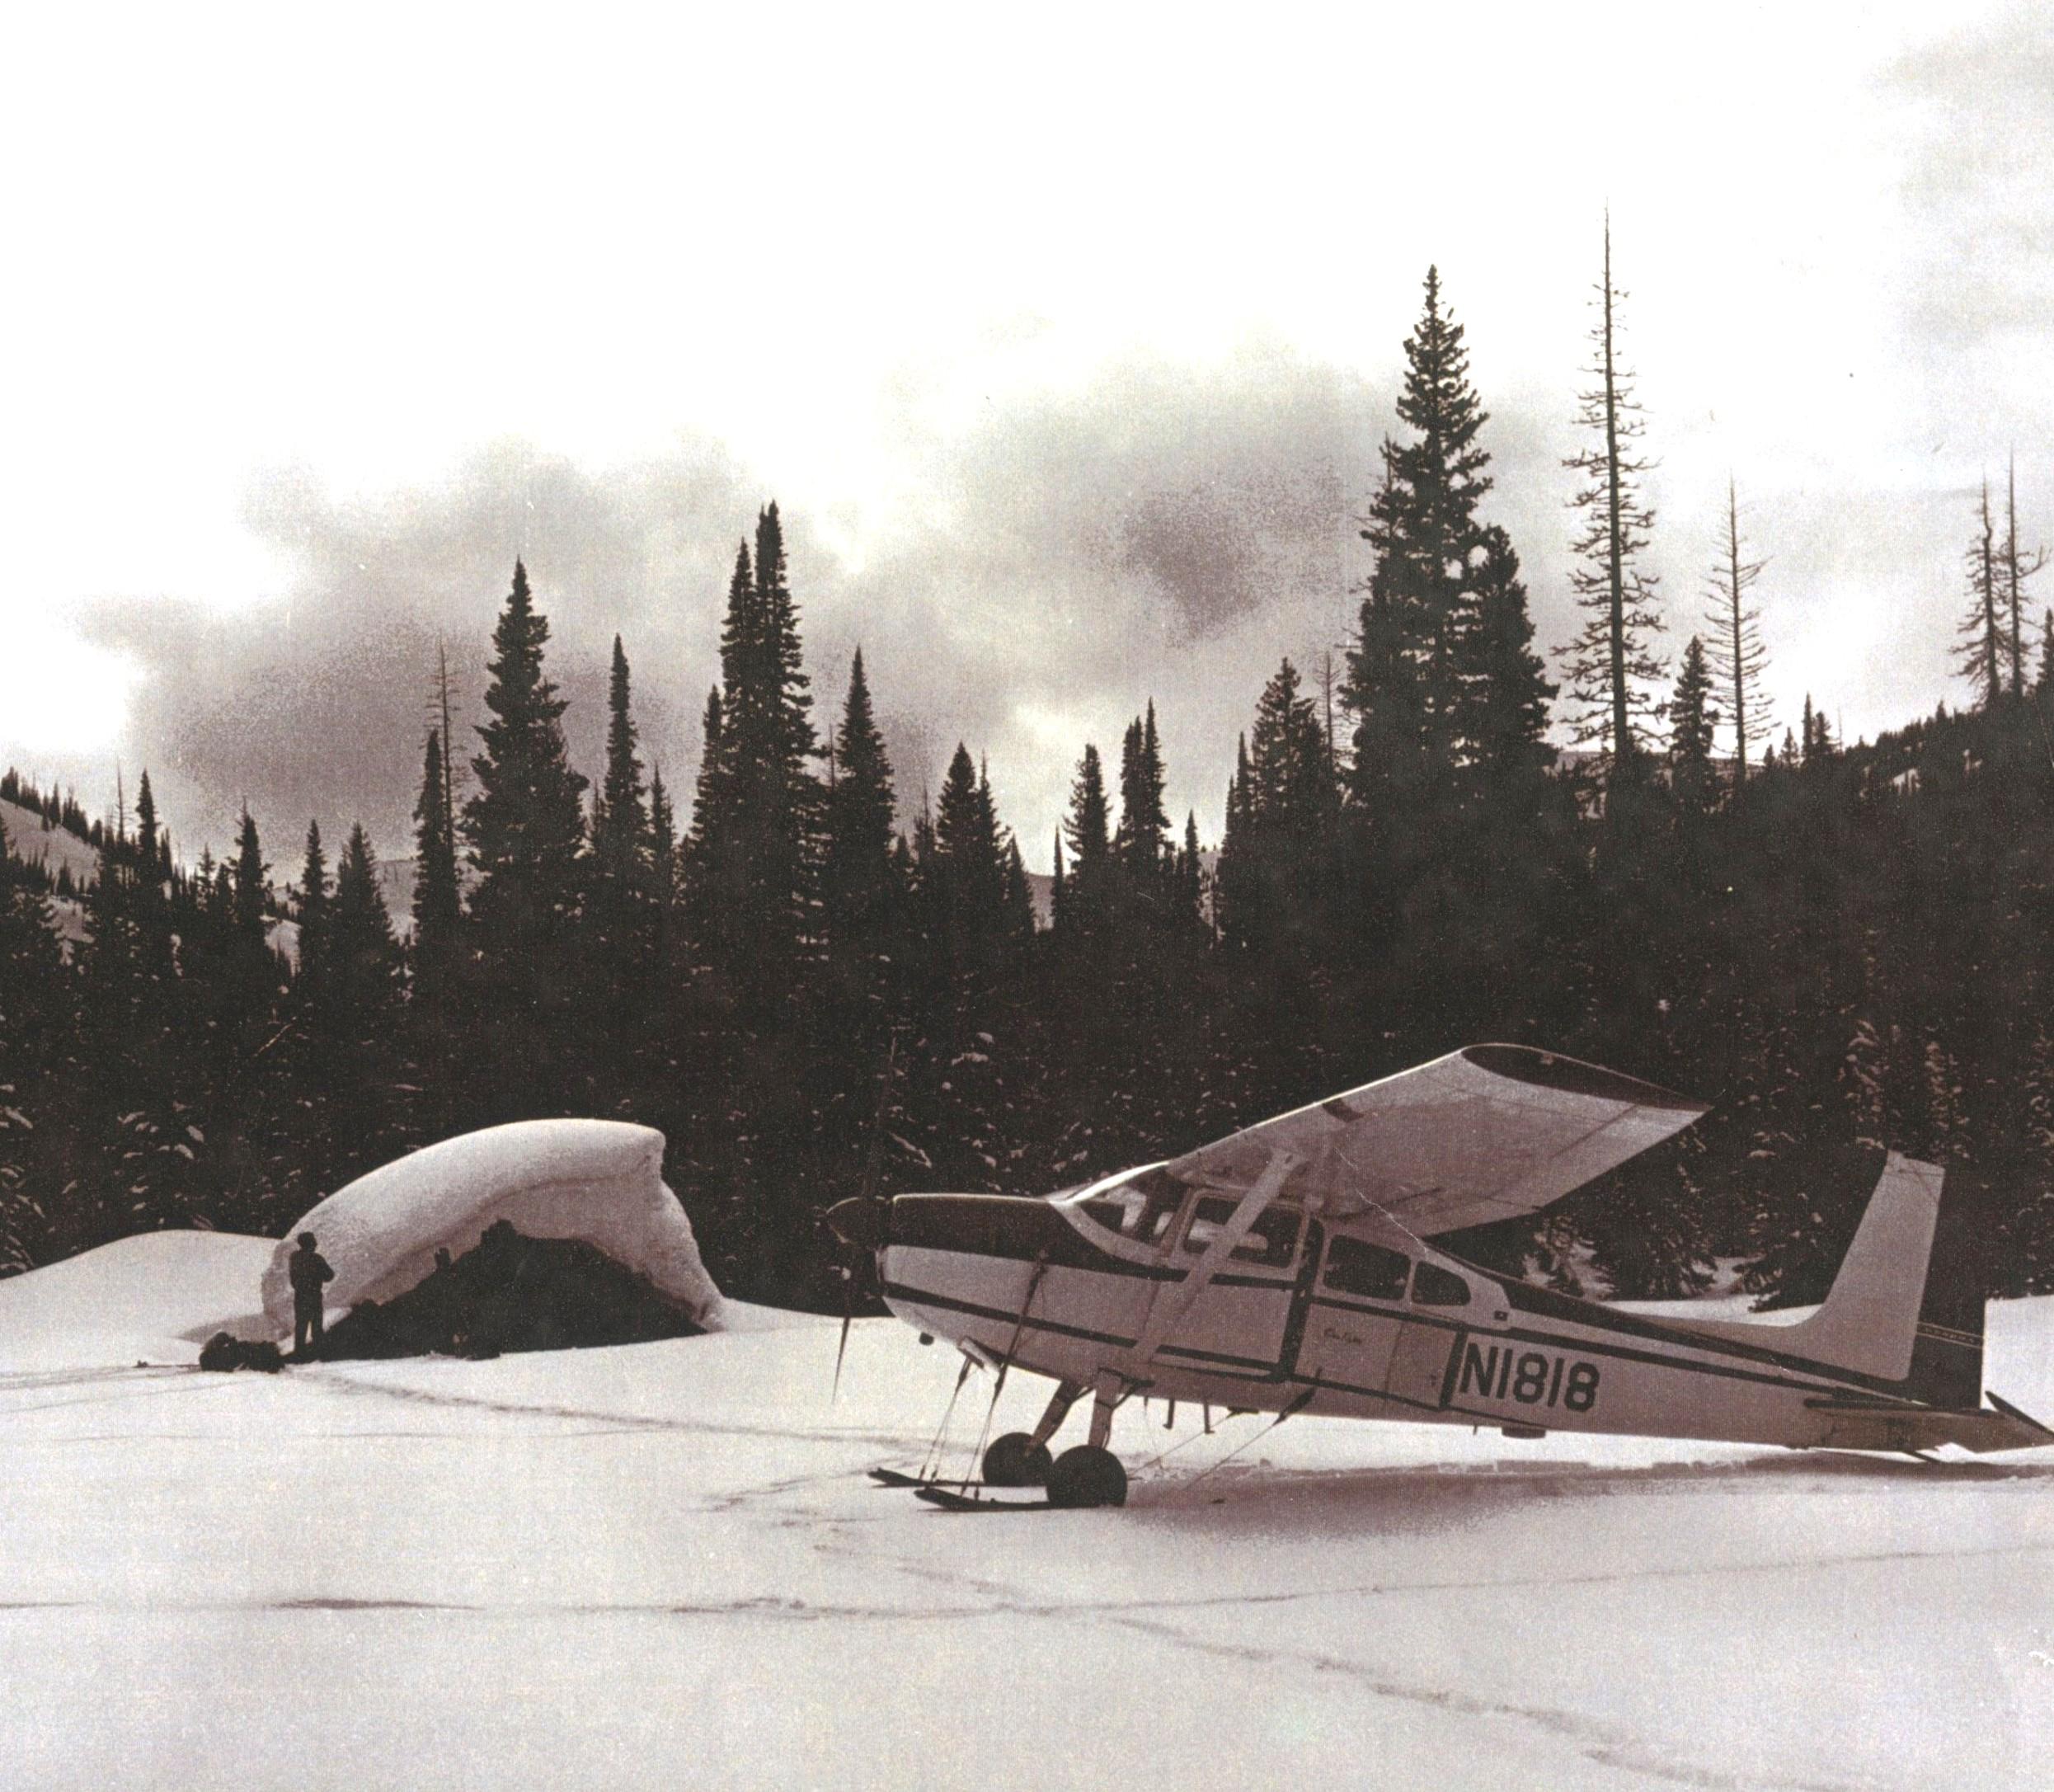 C-180-winter-skiis.JPG